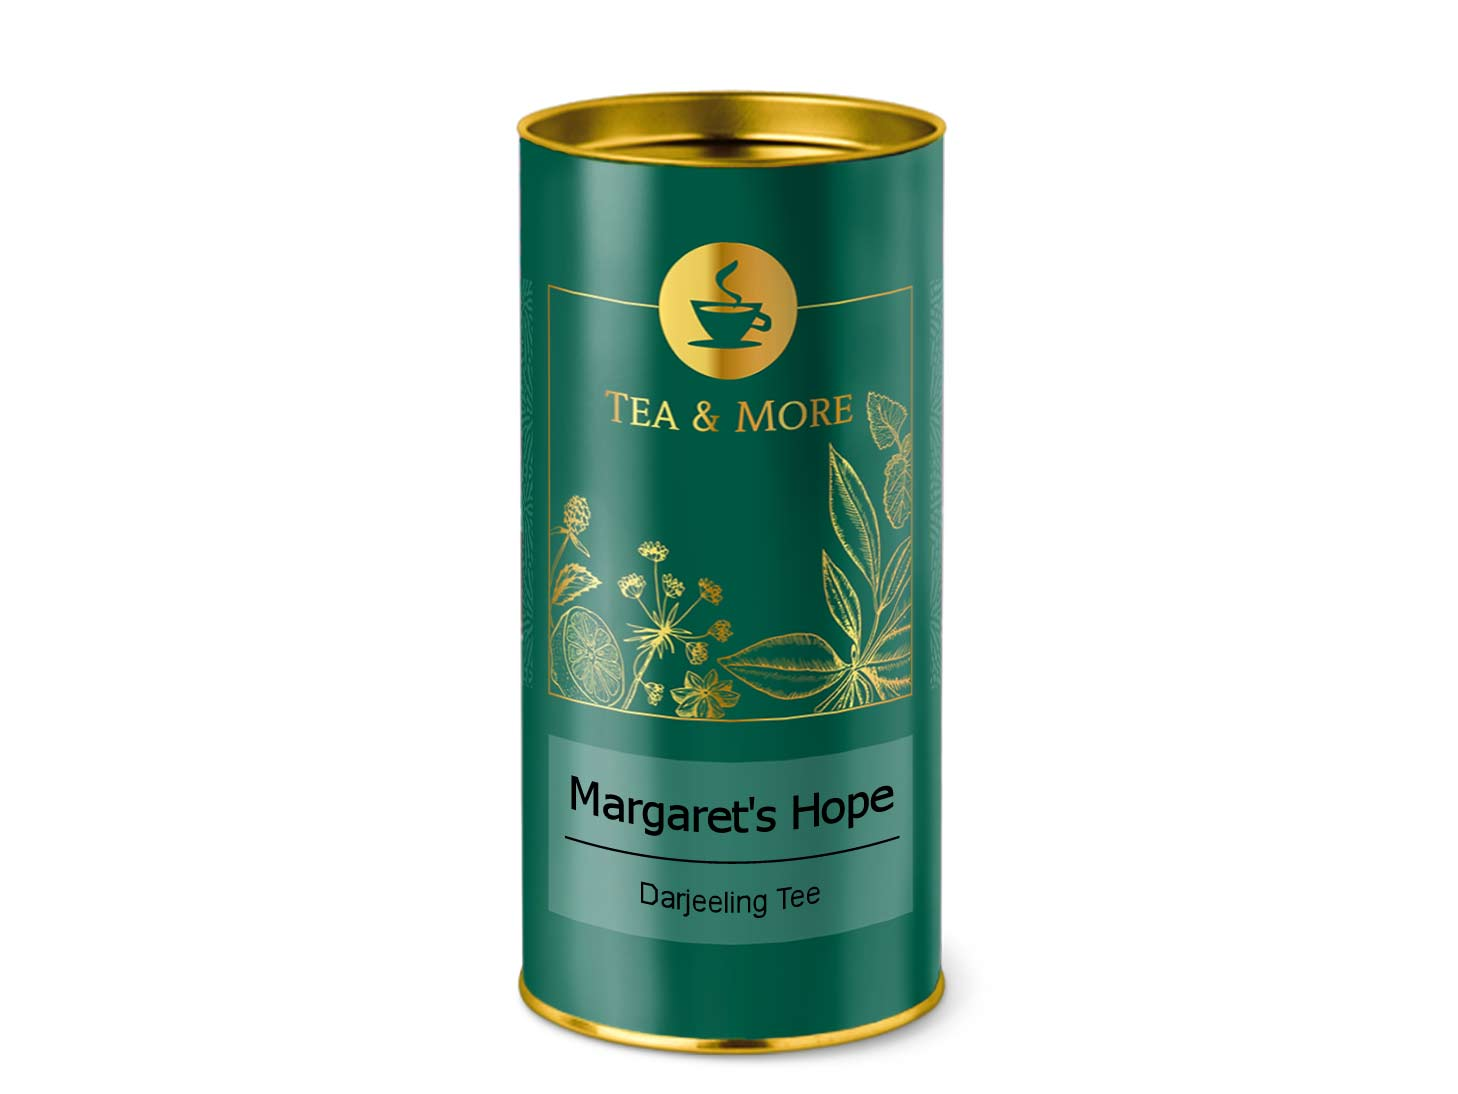 Darjeeling Margaret's Hope